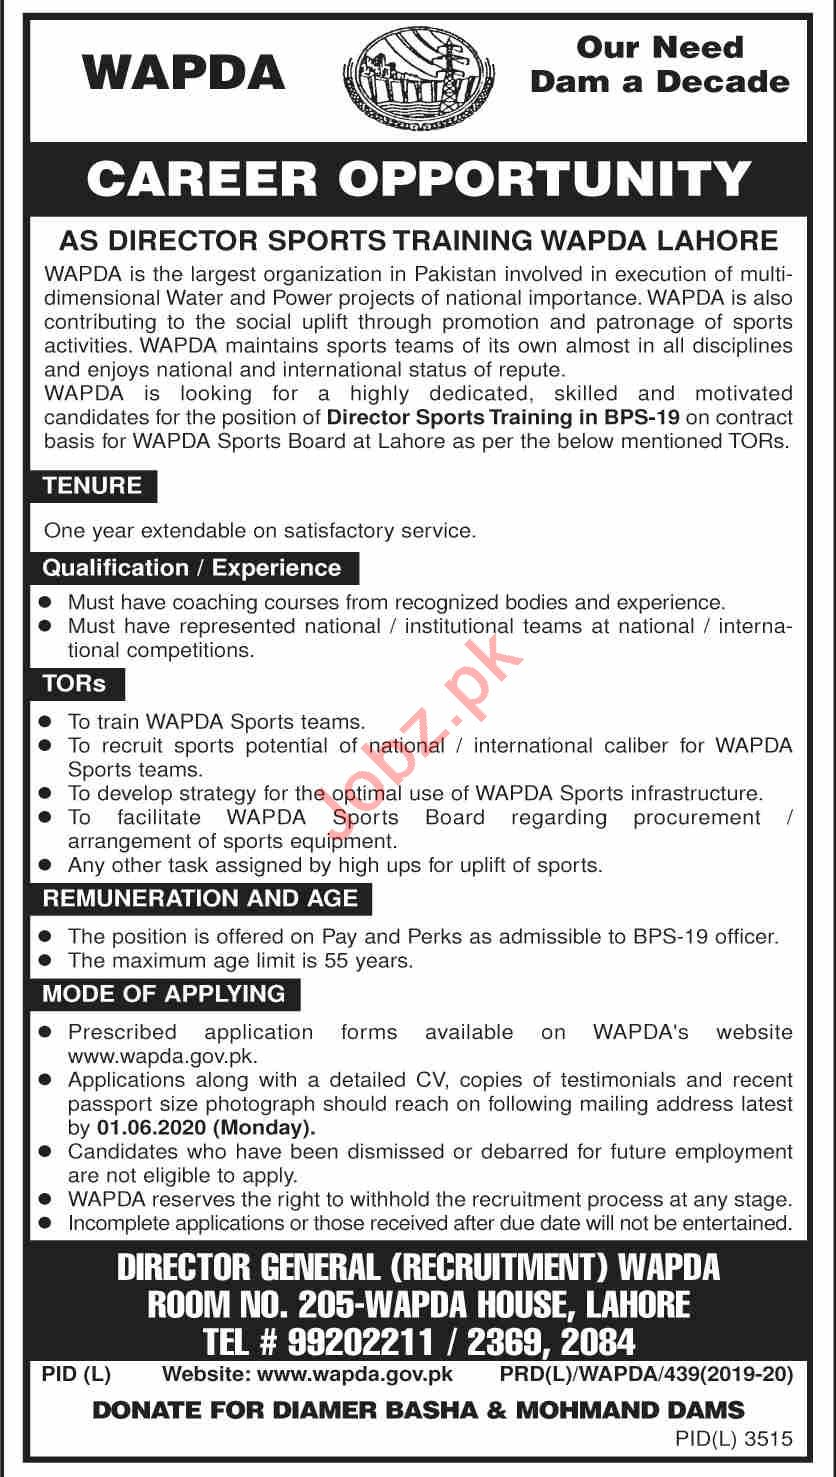 WAPDA Sports Complex Lahore Jobs 2020 for Director Sports